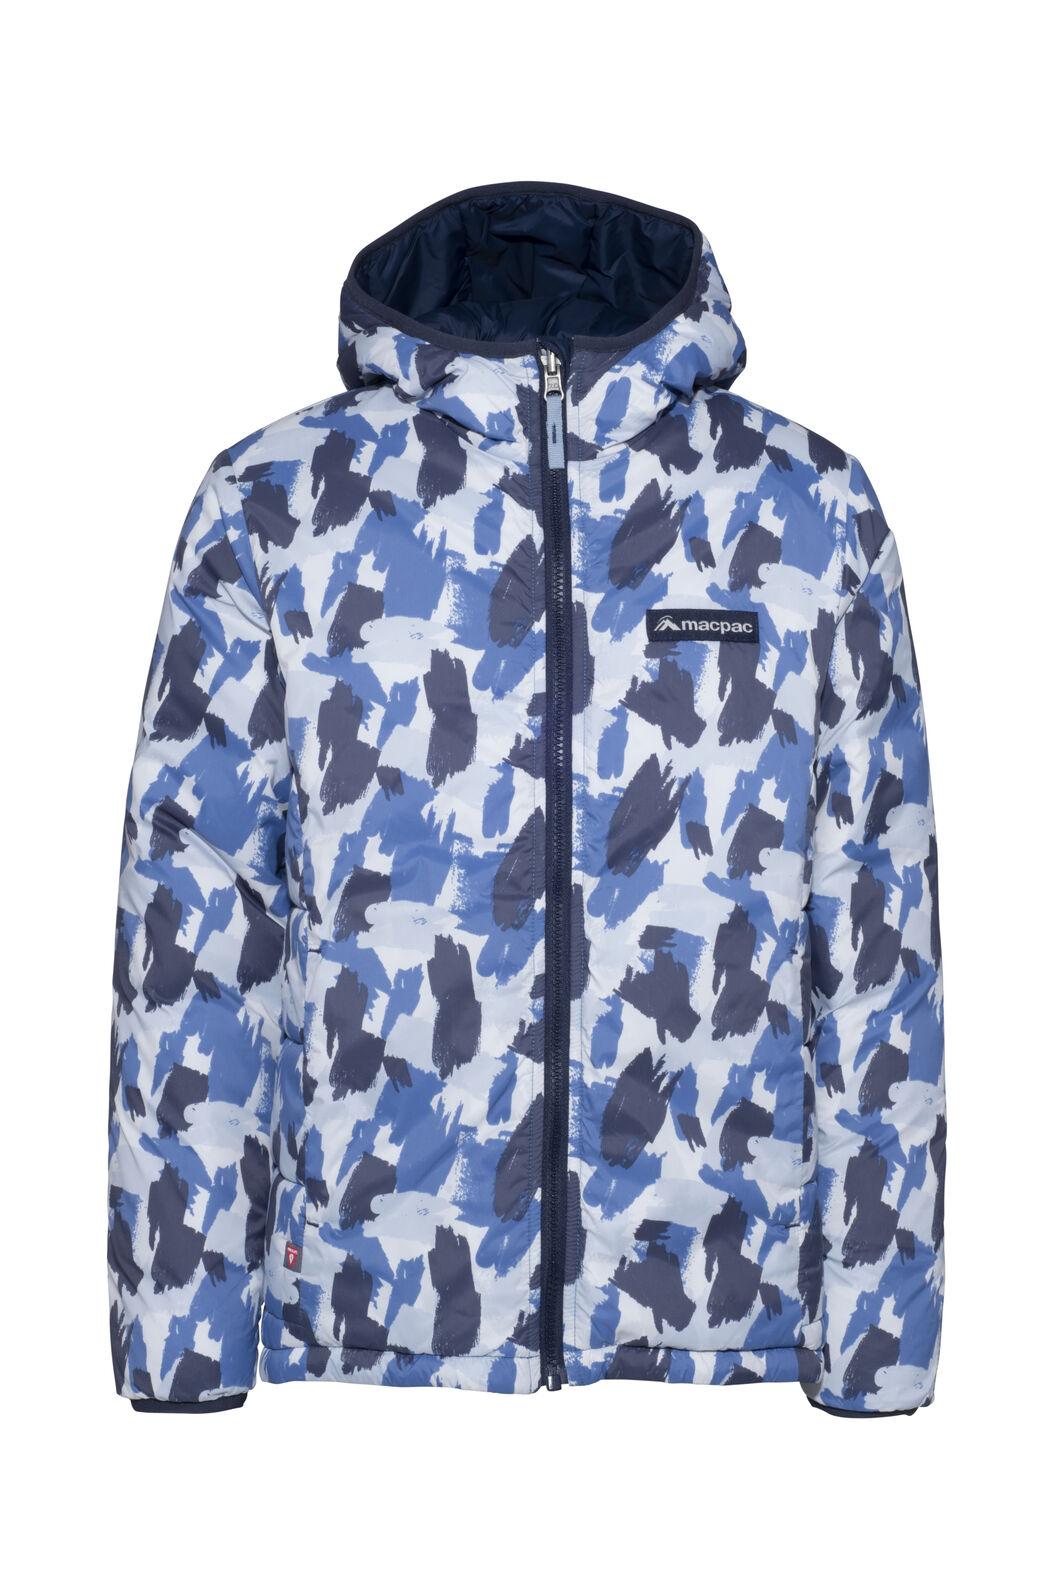 Macpac Pulsar Alpha PrimaLoft® Hooded Jacket — Kids', Blue Camo/Black Iris, hi-res